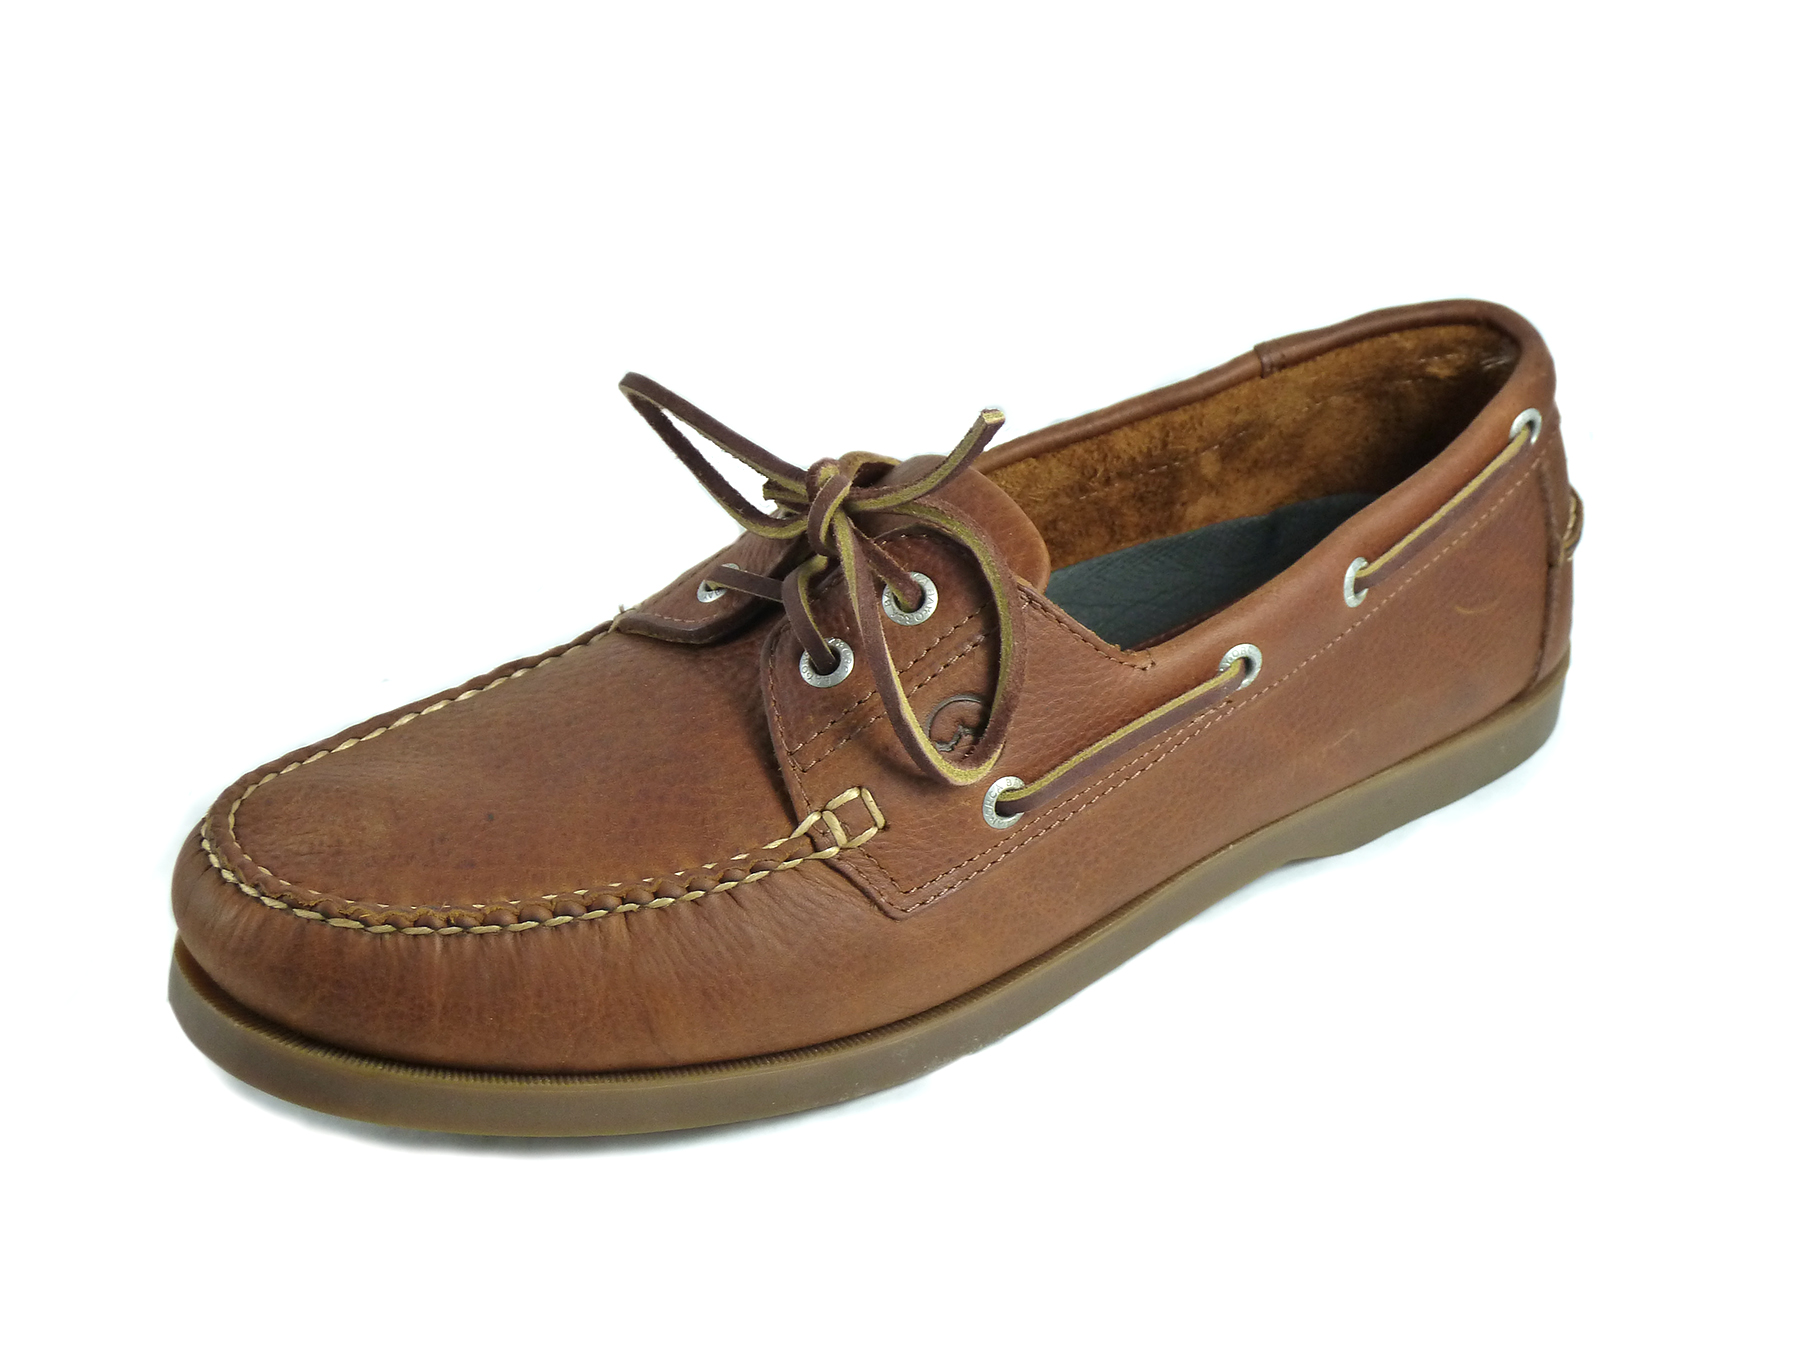 orca bay creek s deck shoe handmade leather shoes